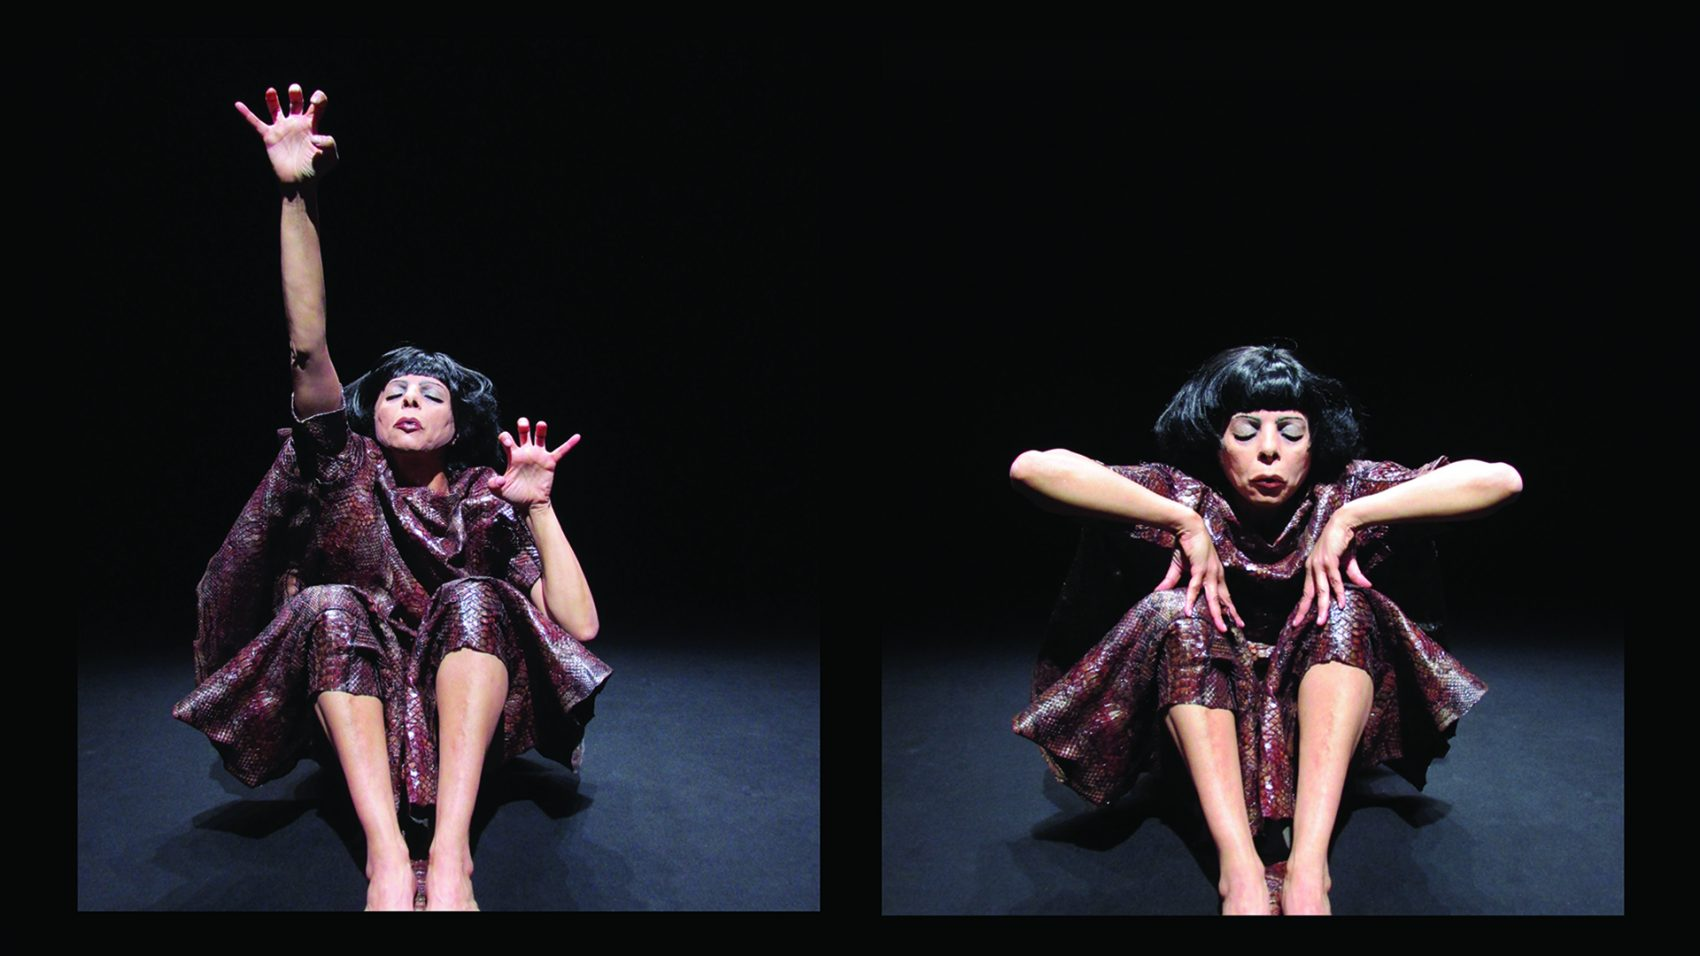 Nadia Lauro – Mue - Mue 2013